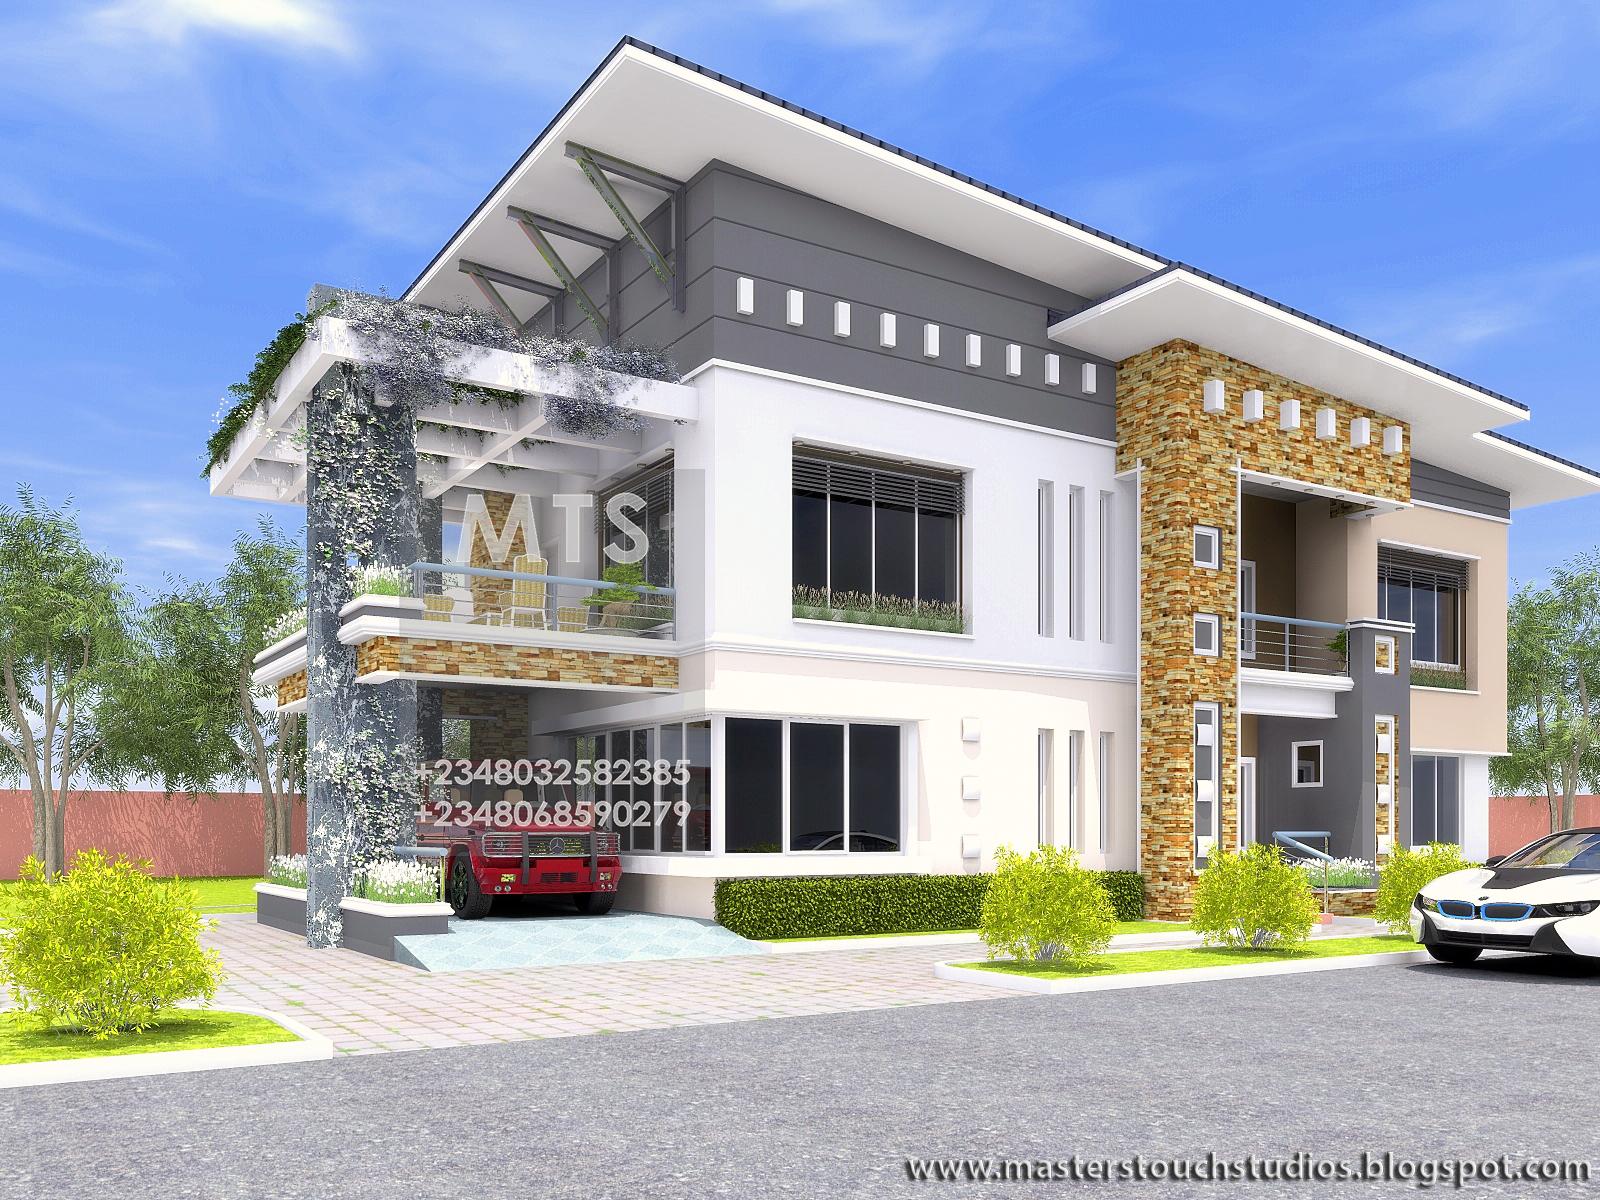 Best Kitchen Gallery: Engr Eddy 6 Bedroom Duplex Residential Homes And Public Designs of Modern Duplex House In Nigeria on rachelxblog.com